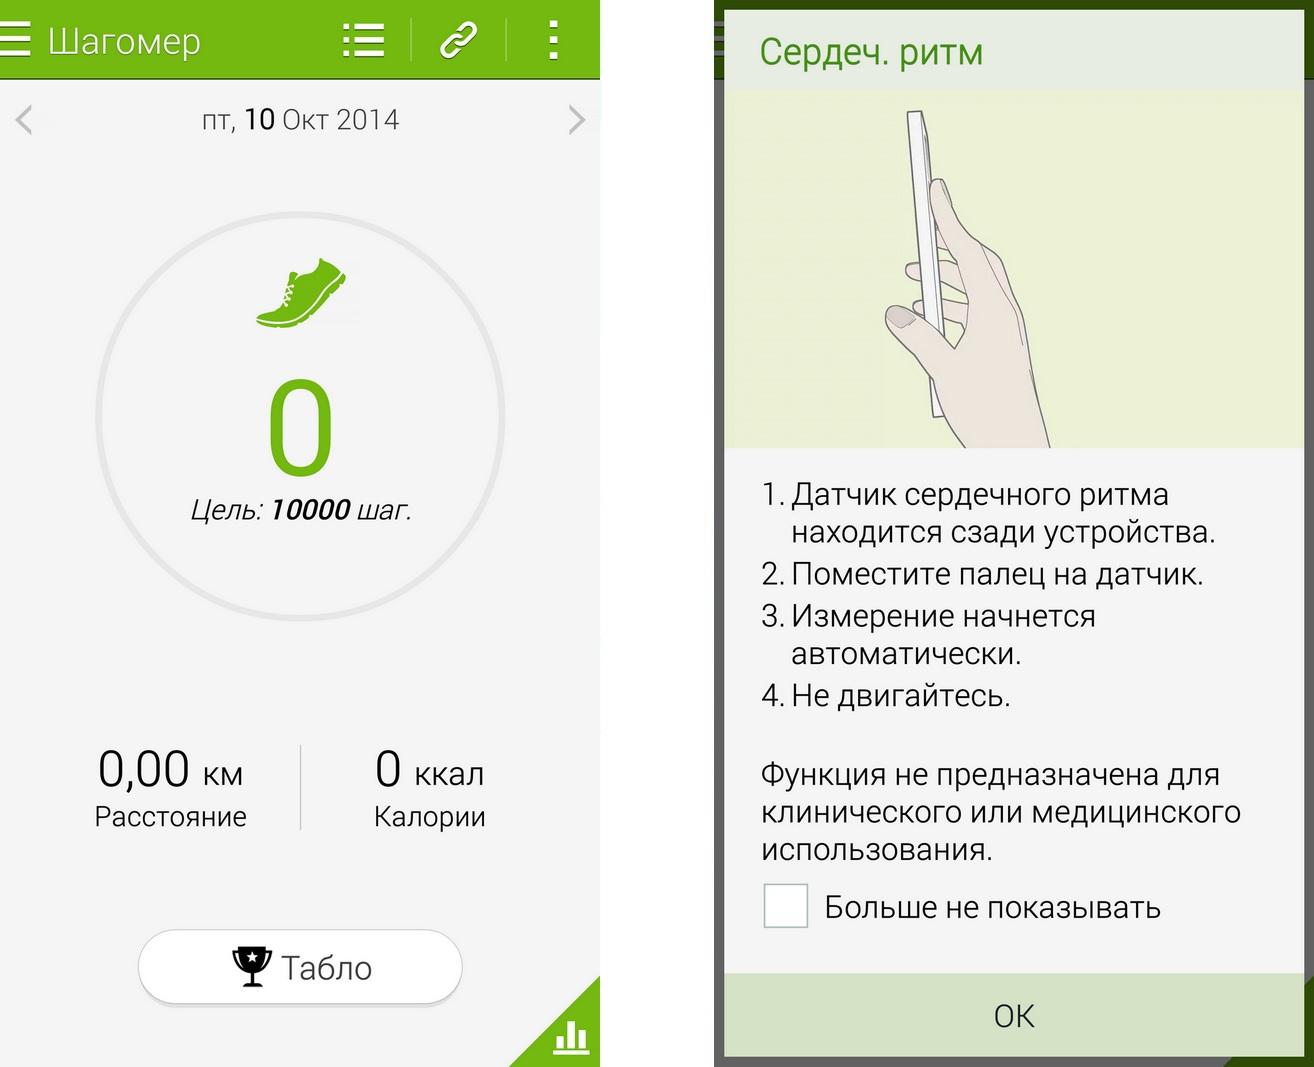 Samsung Galaxy Note 4-скриншот